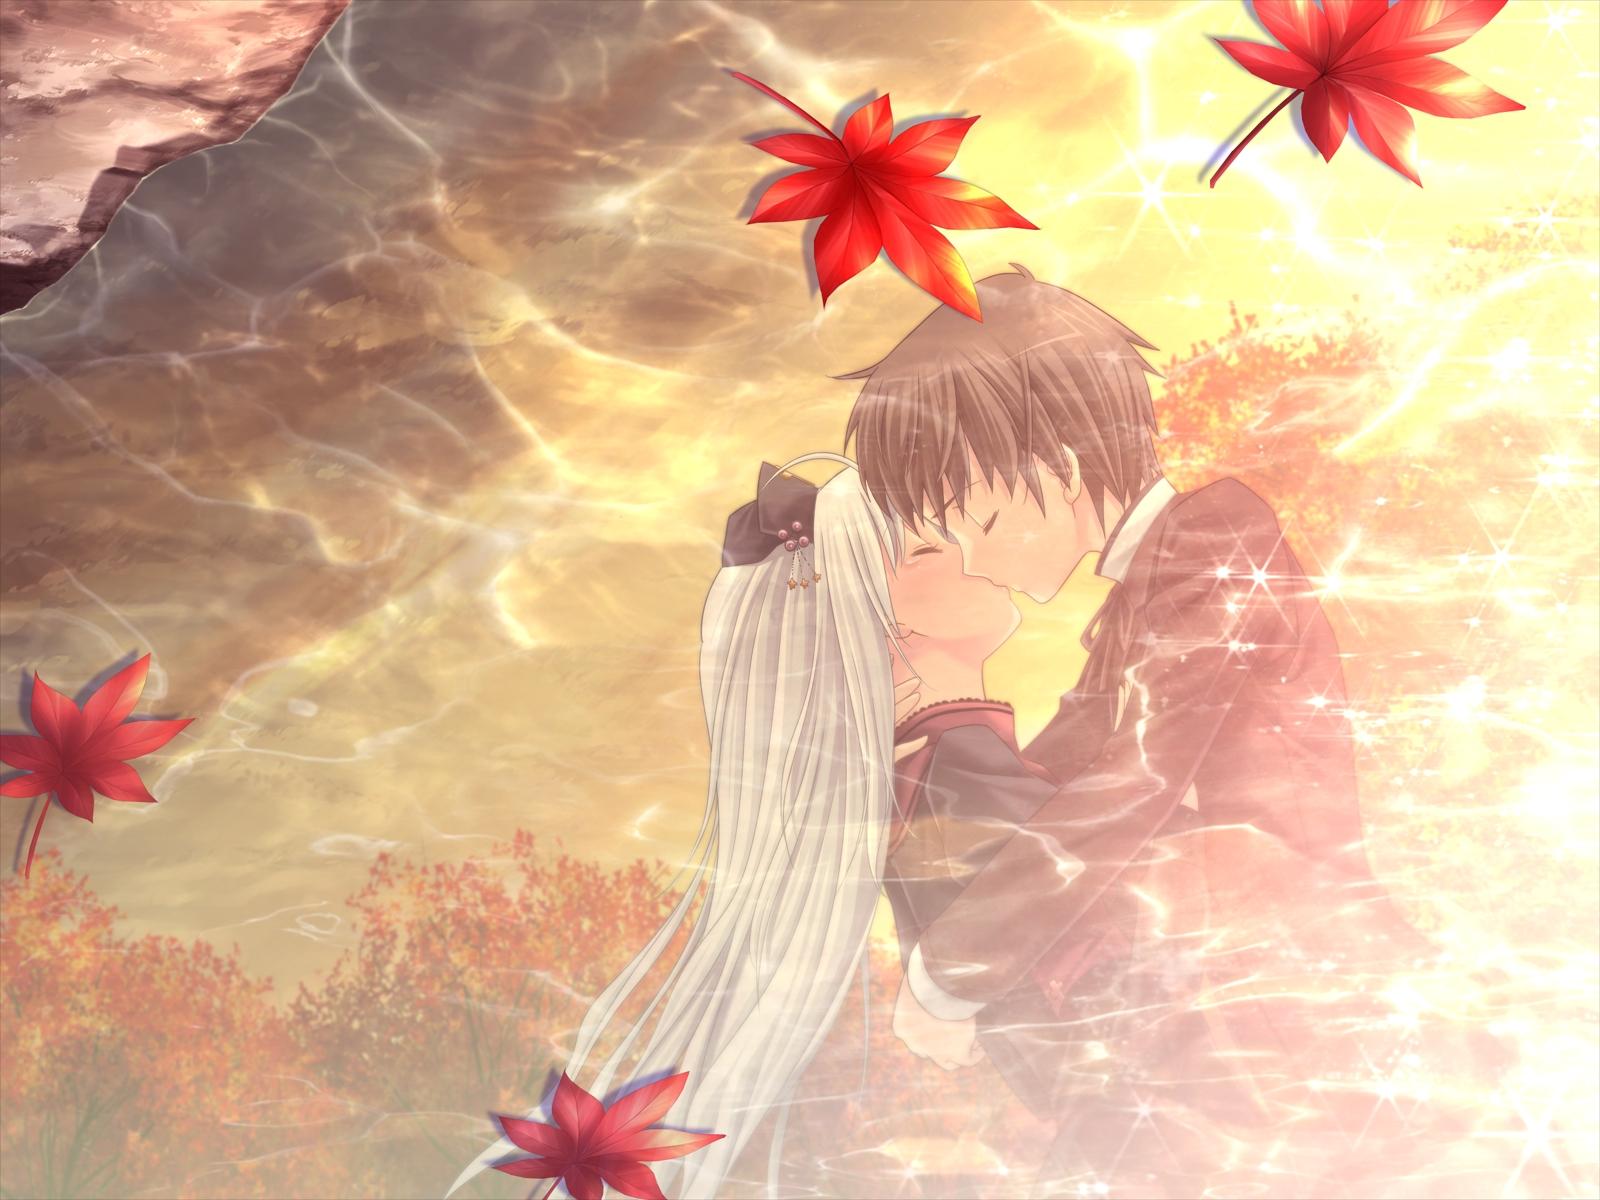 game_cg kiss kitto_todoku_sumiwataru_asairo_yori_mo kumigami_hiyo leaves propeller water white_hair yasuyuki